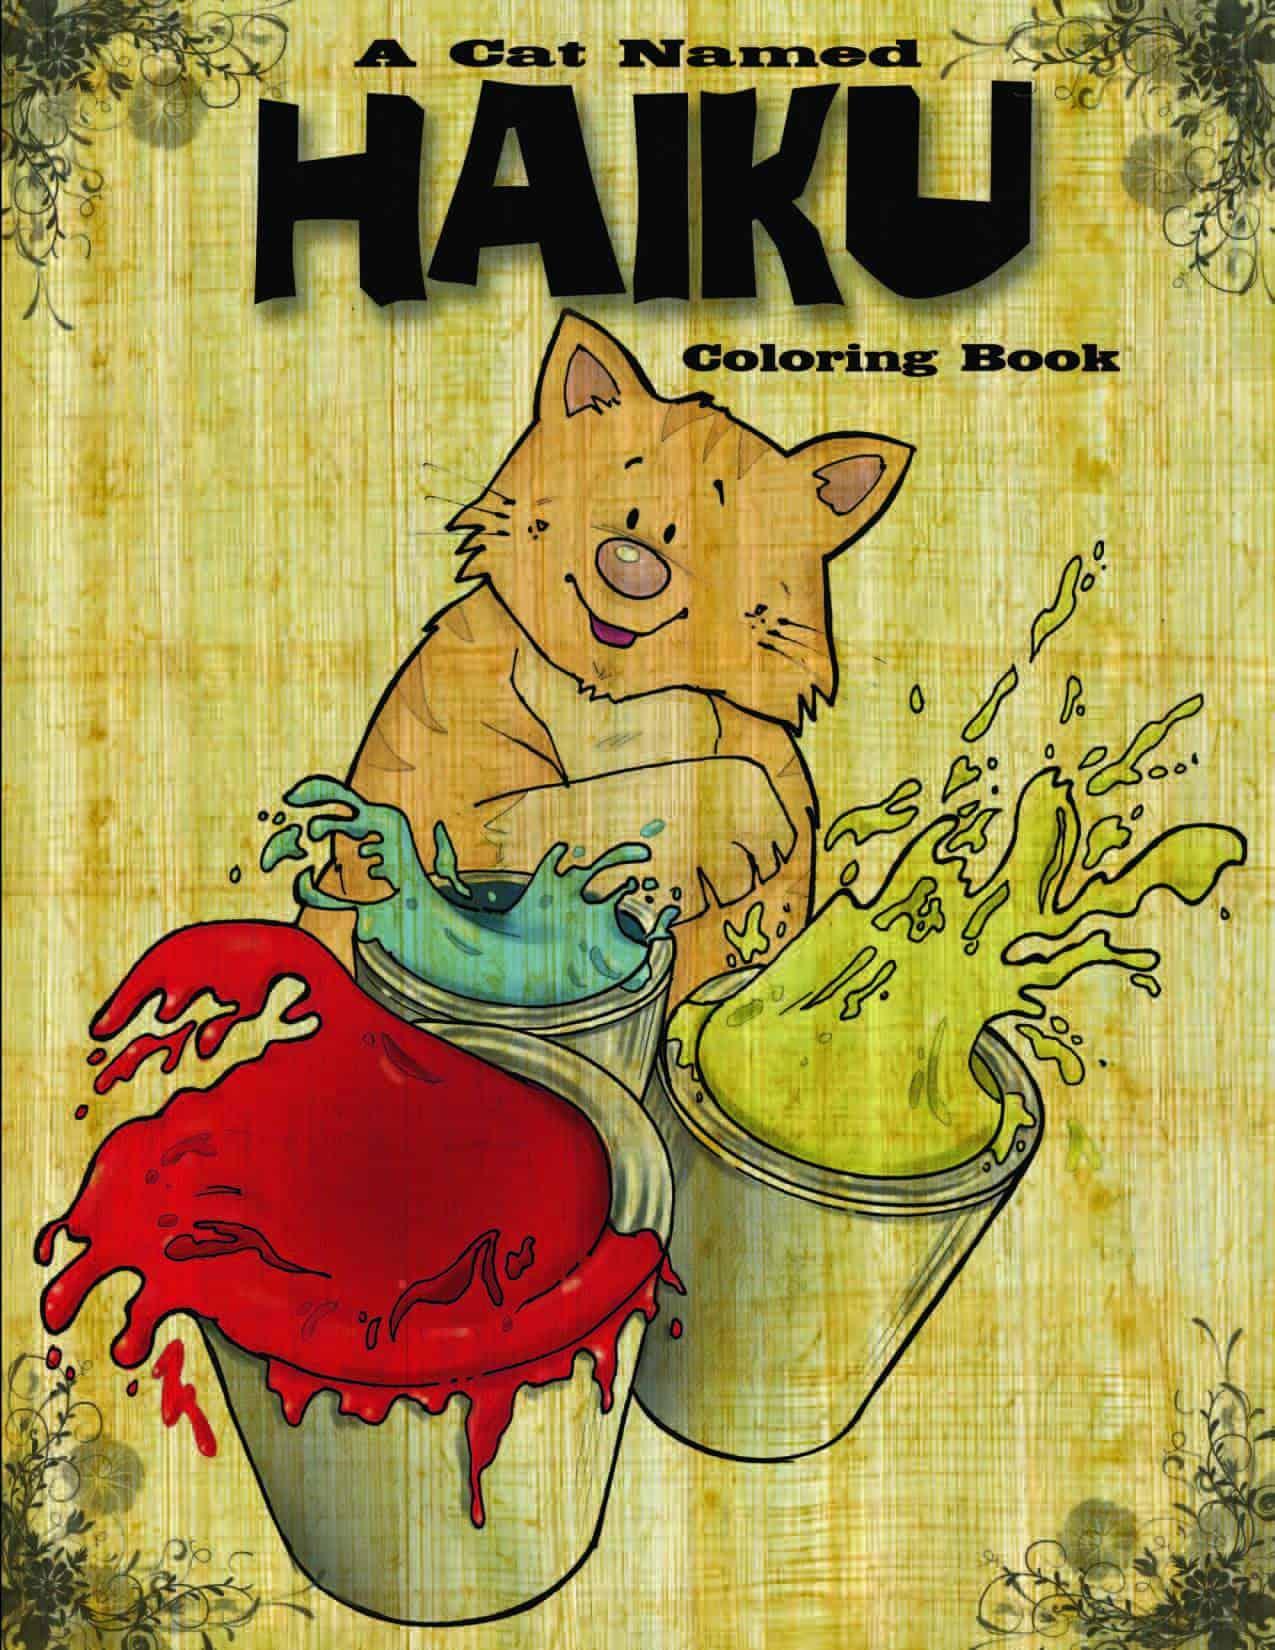 A Cat Named Haiku Coloring Book 1